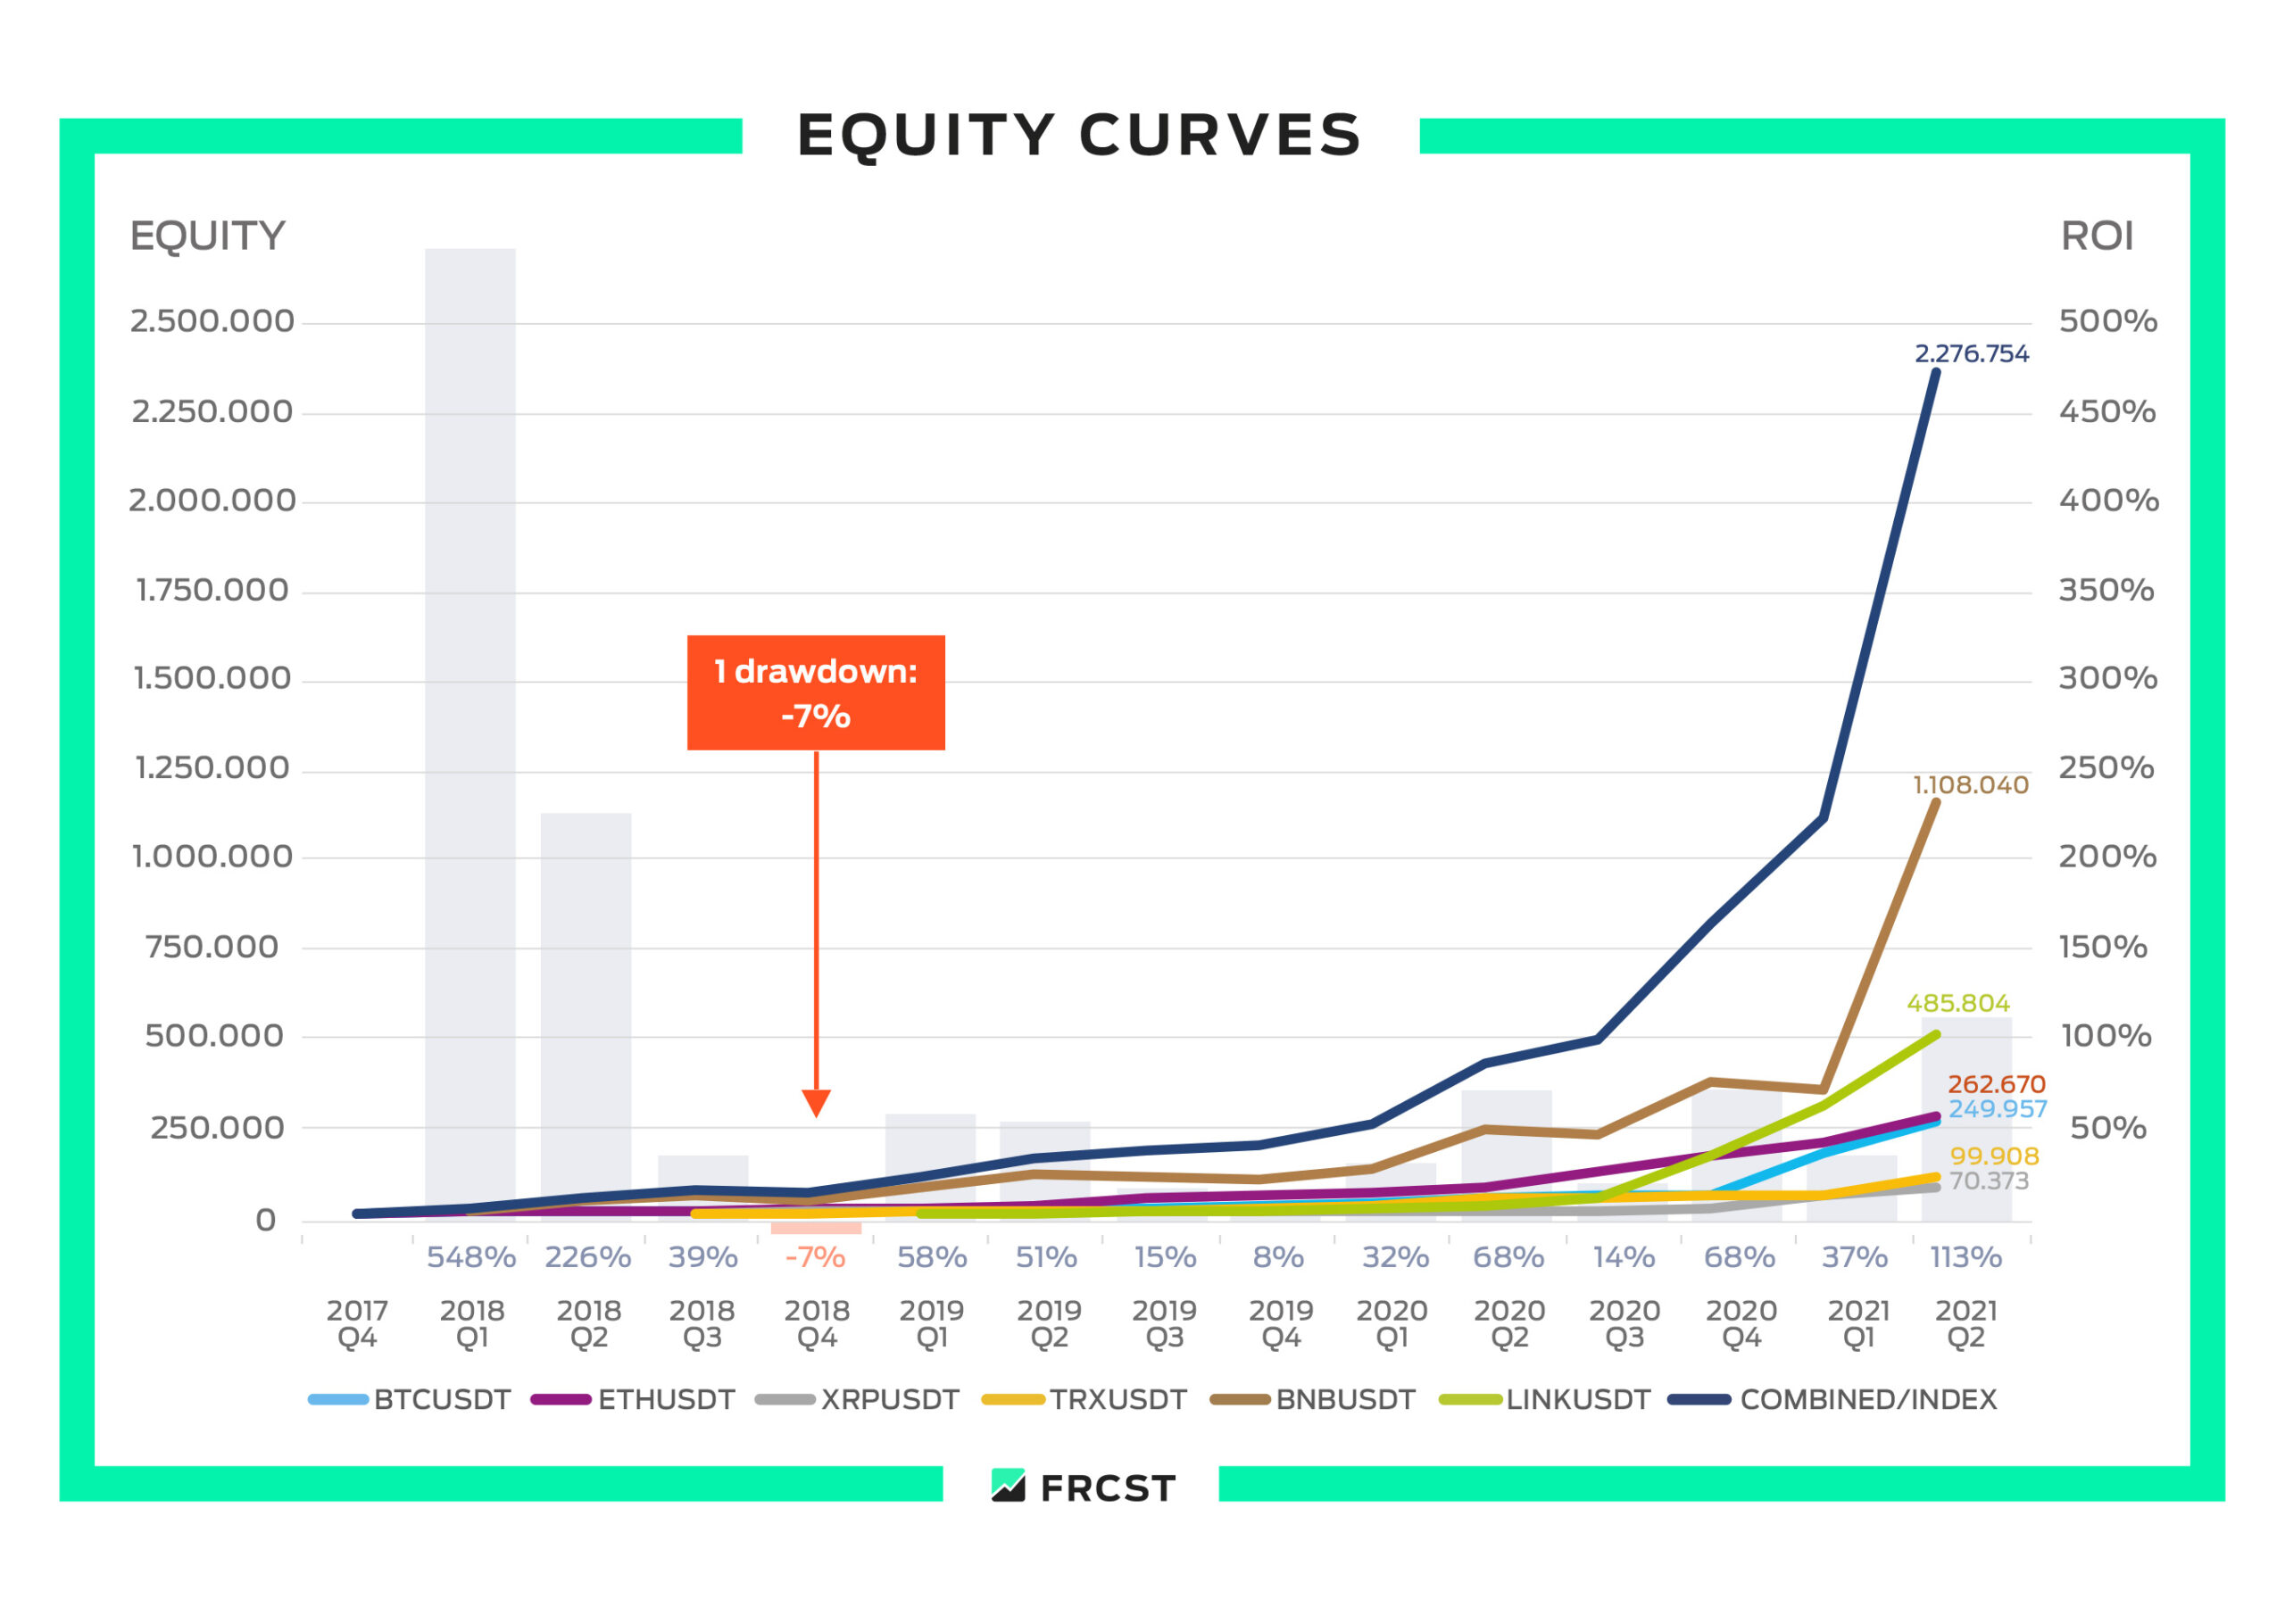 FRCST Equity Curves 2021 Q2